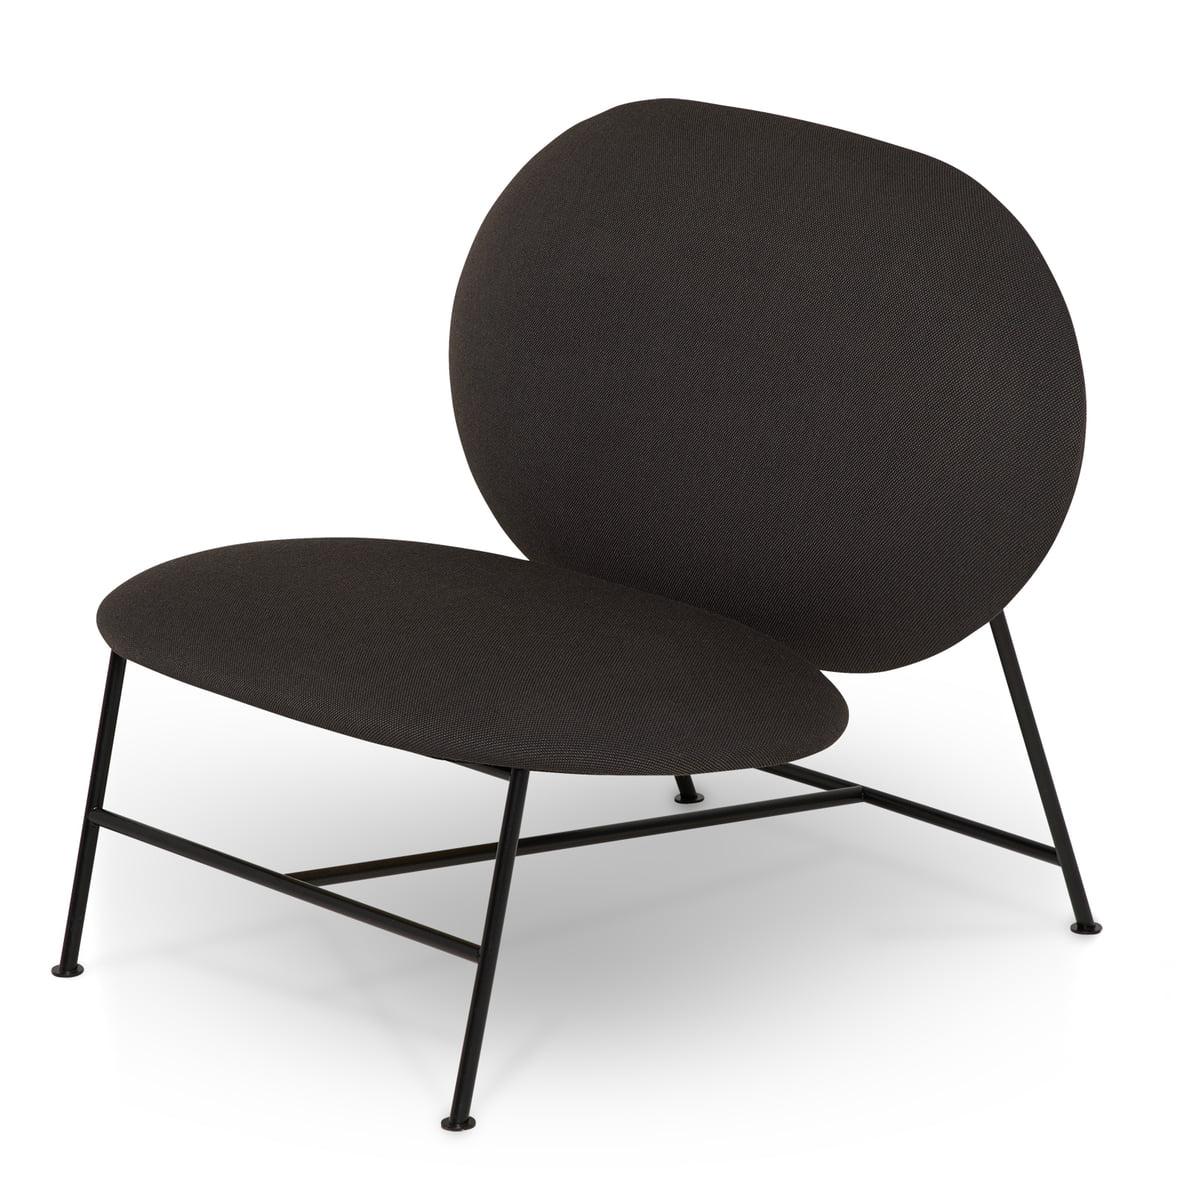 Northern   Oblong Lounge Chair, Black / Dark Grey (Brusvik 08)